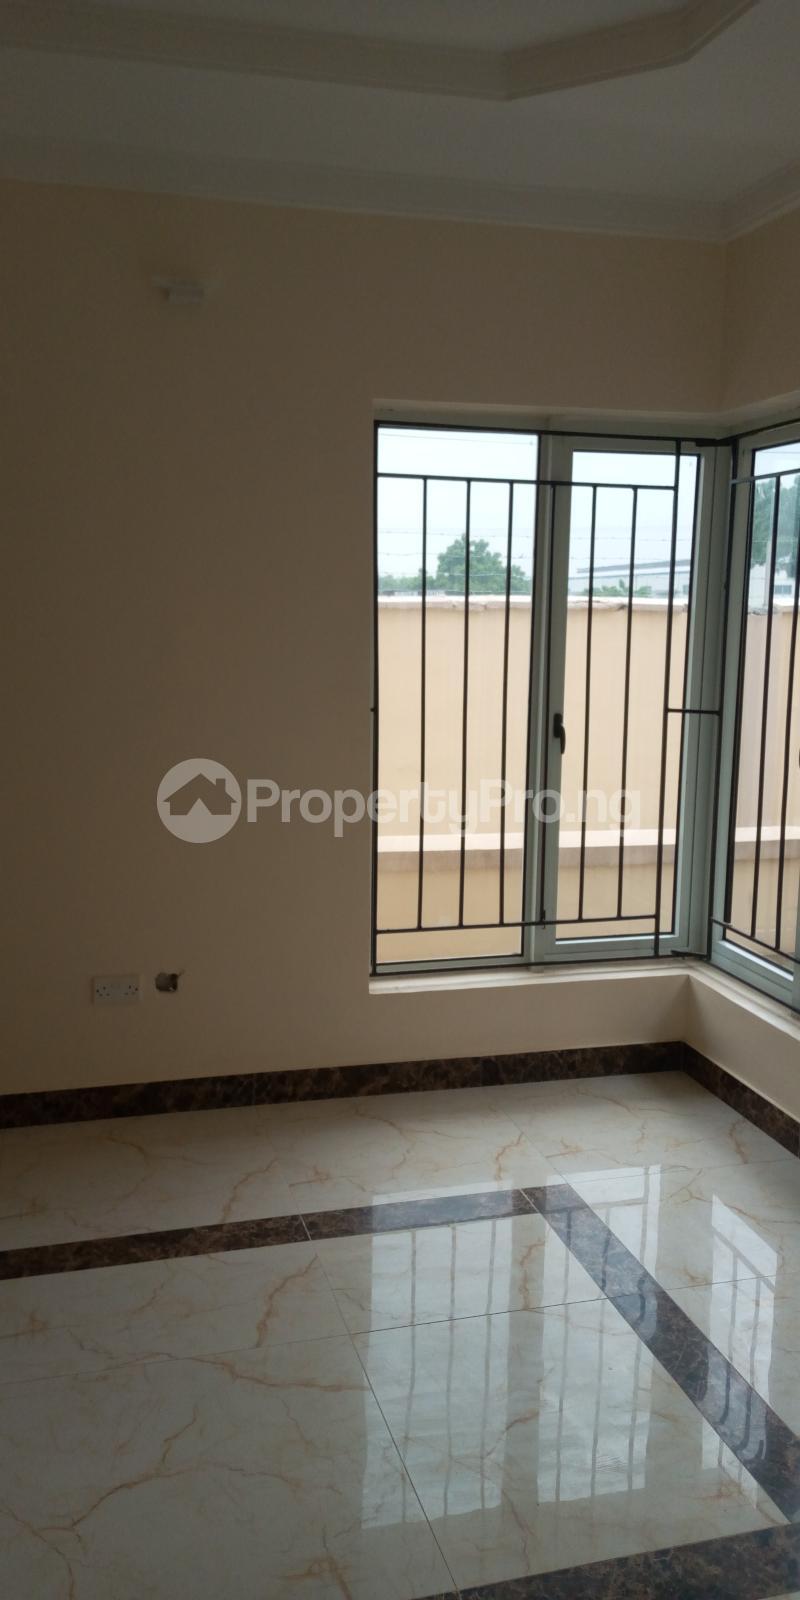 5 bedroom Detached Duplex House for rent Peace Gardens Estate Monastery road Sangotedo Lagos - 3